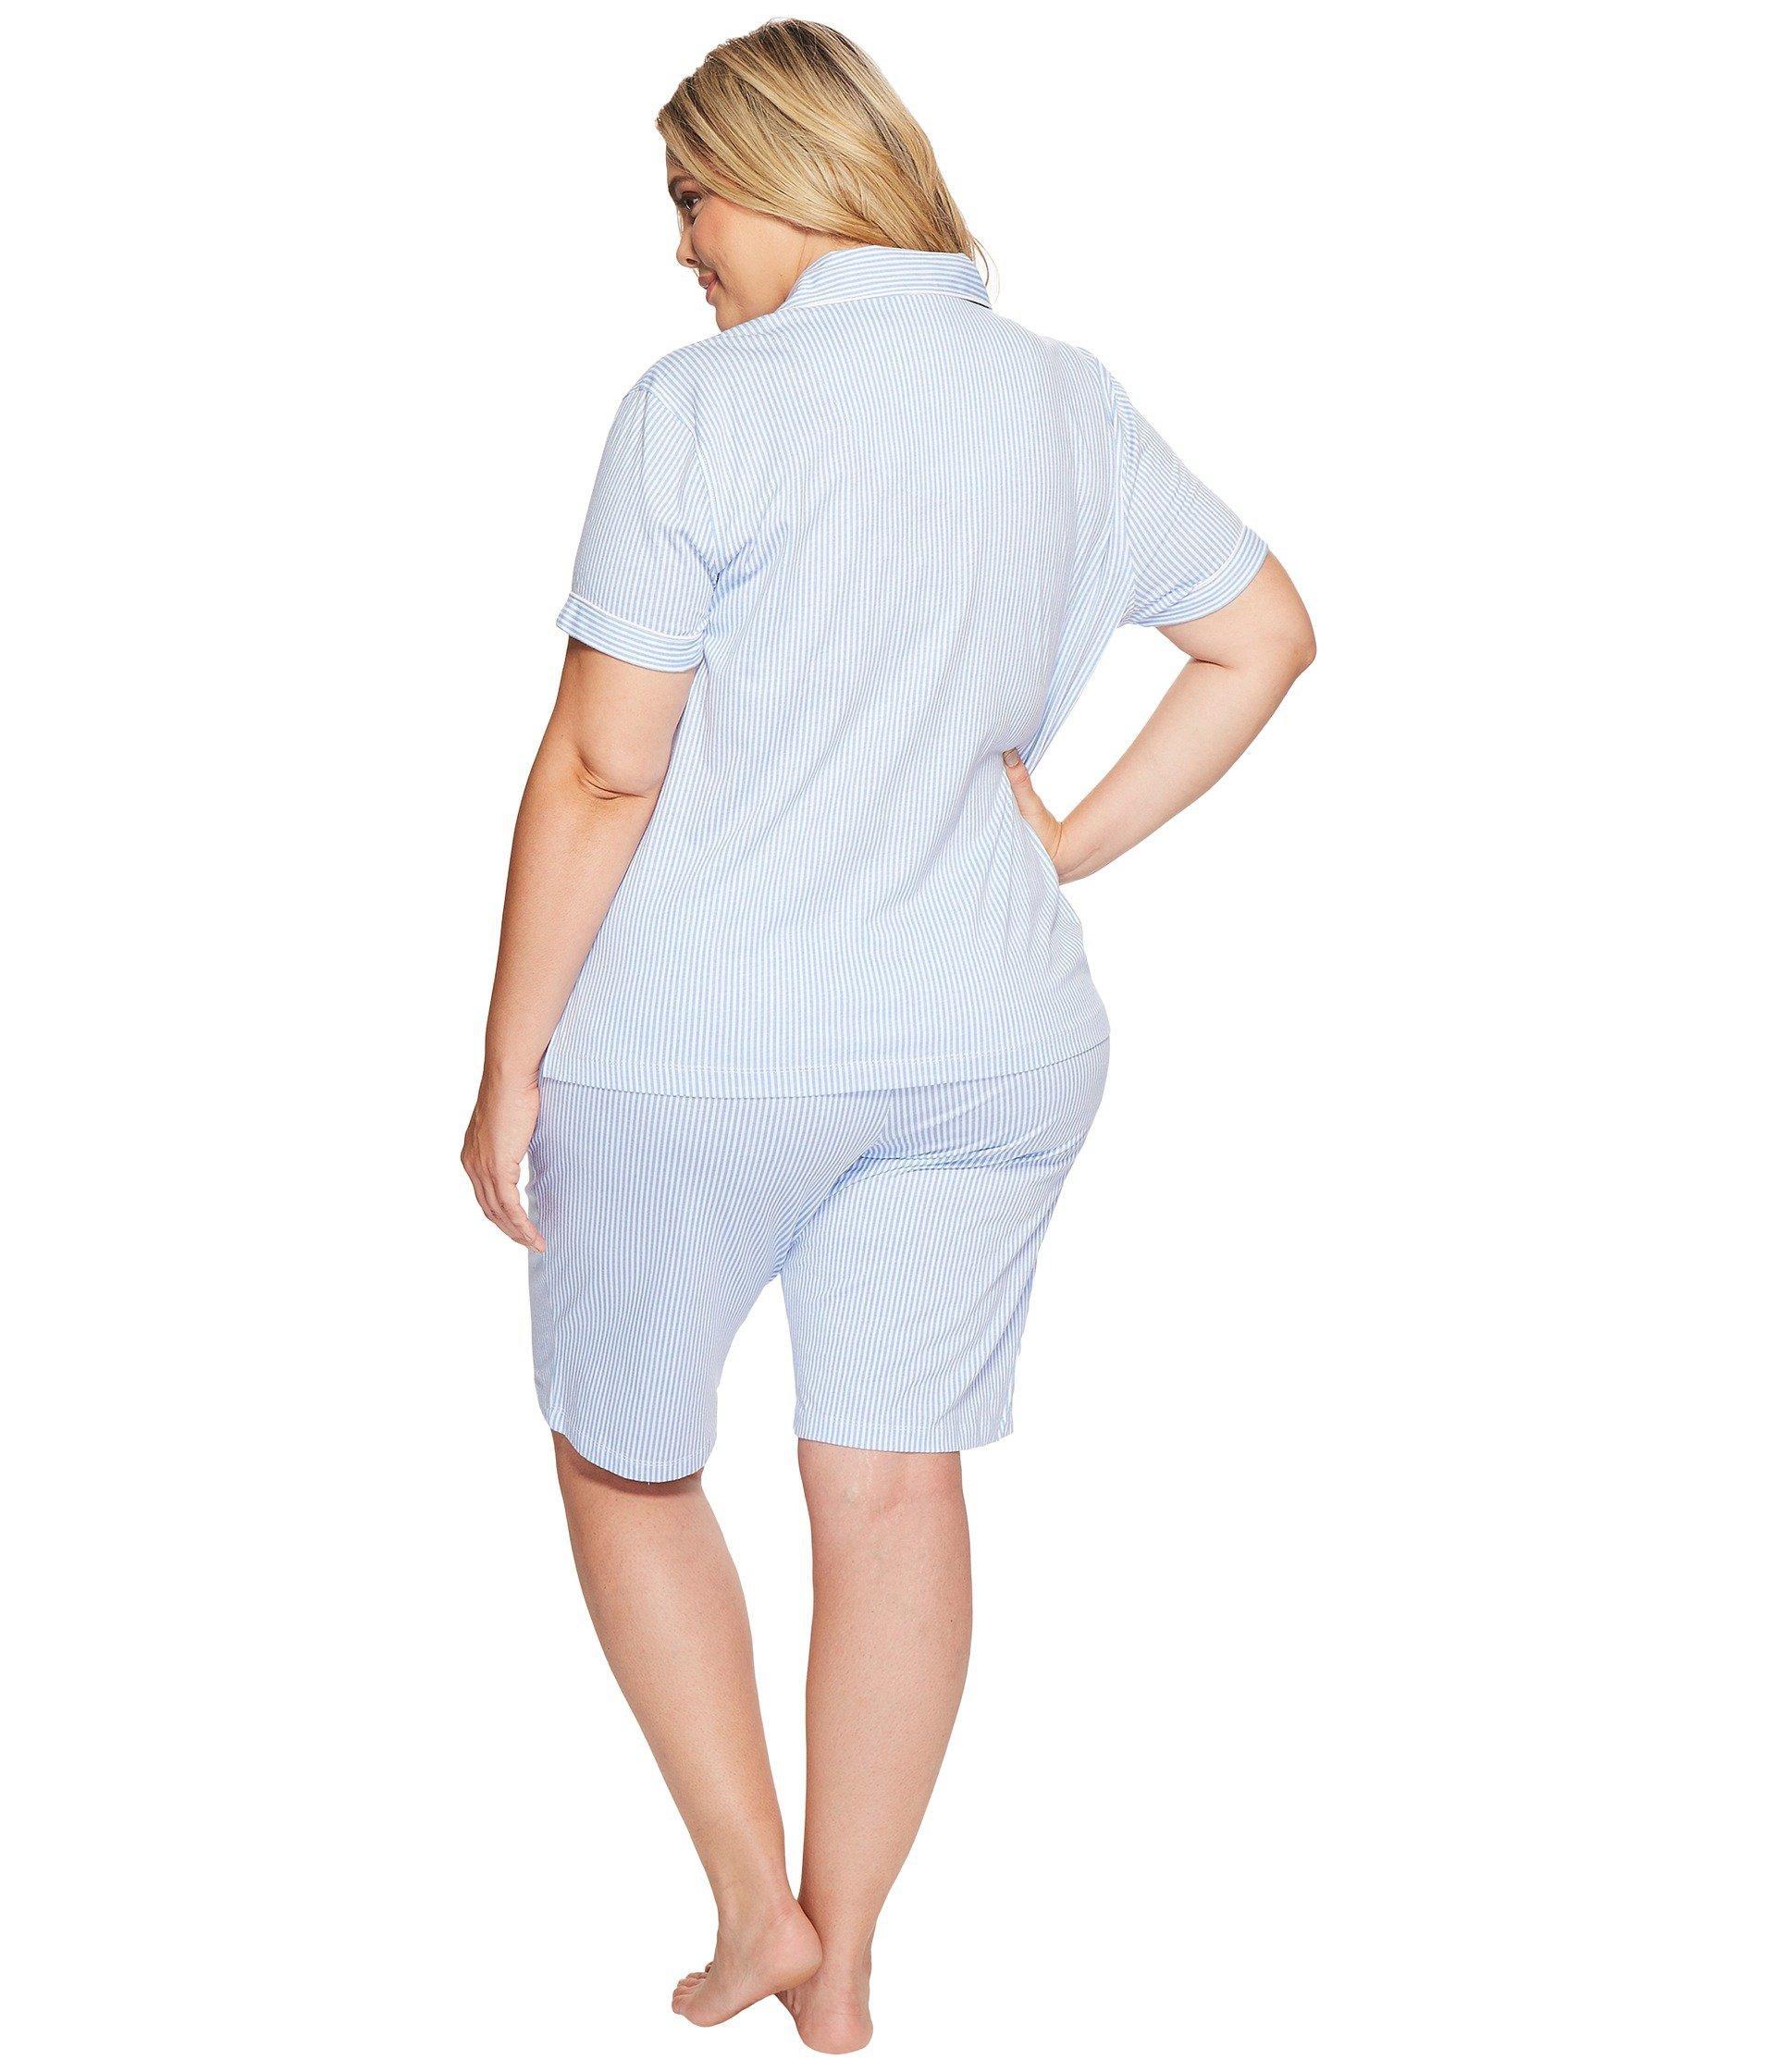 9e6095fbad Lauren by Ralph Lauren - Blue Plus Size Short Sleeve Notch Collar Bermuda  Shorts Pj Set. View fullscreen